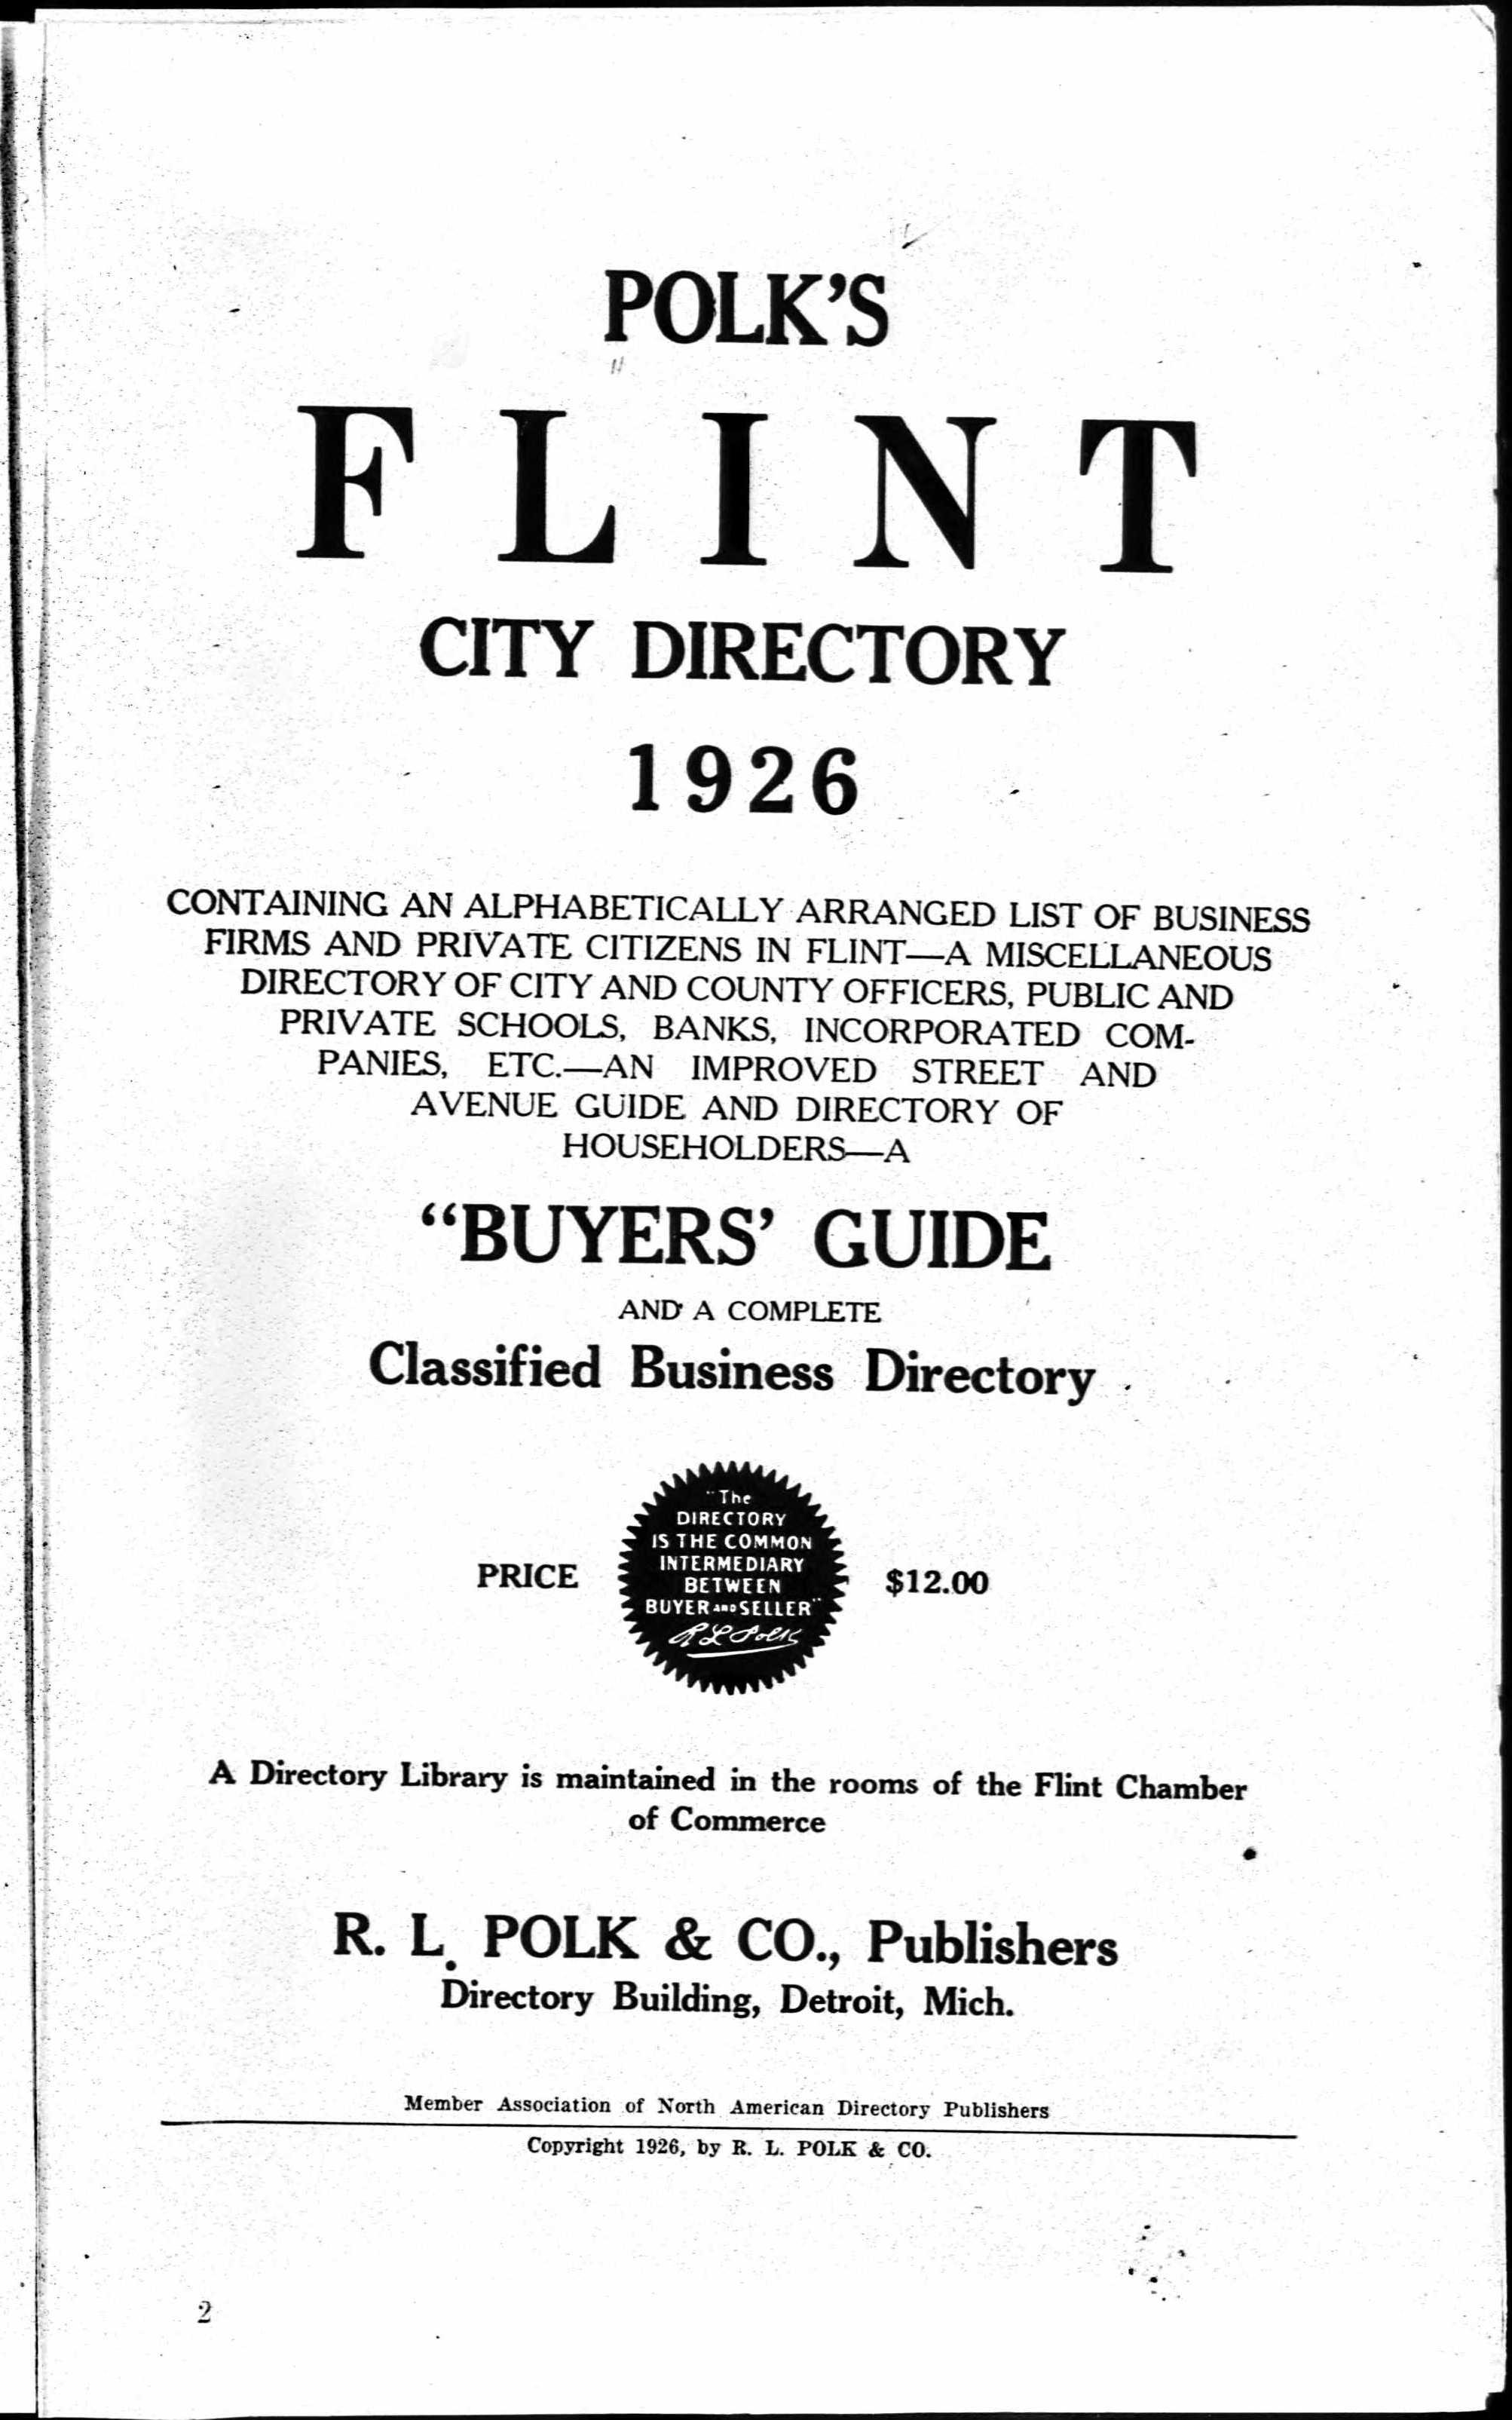 Flint City Directory 1926